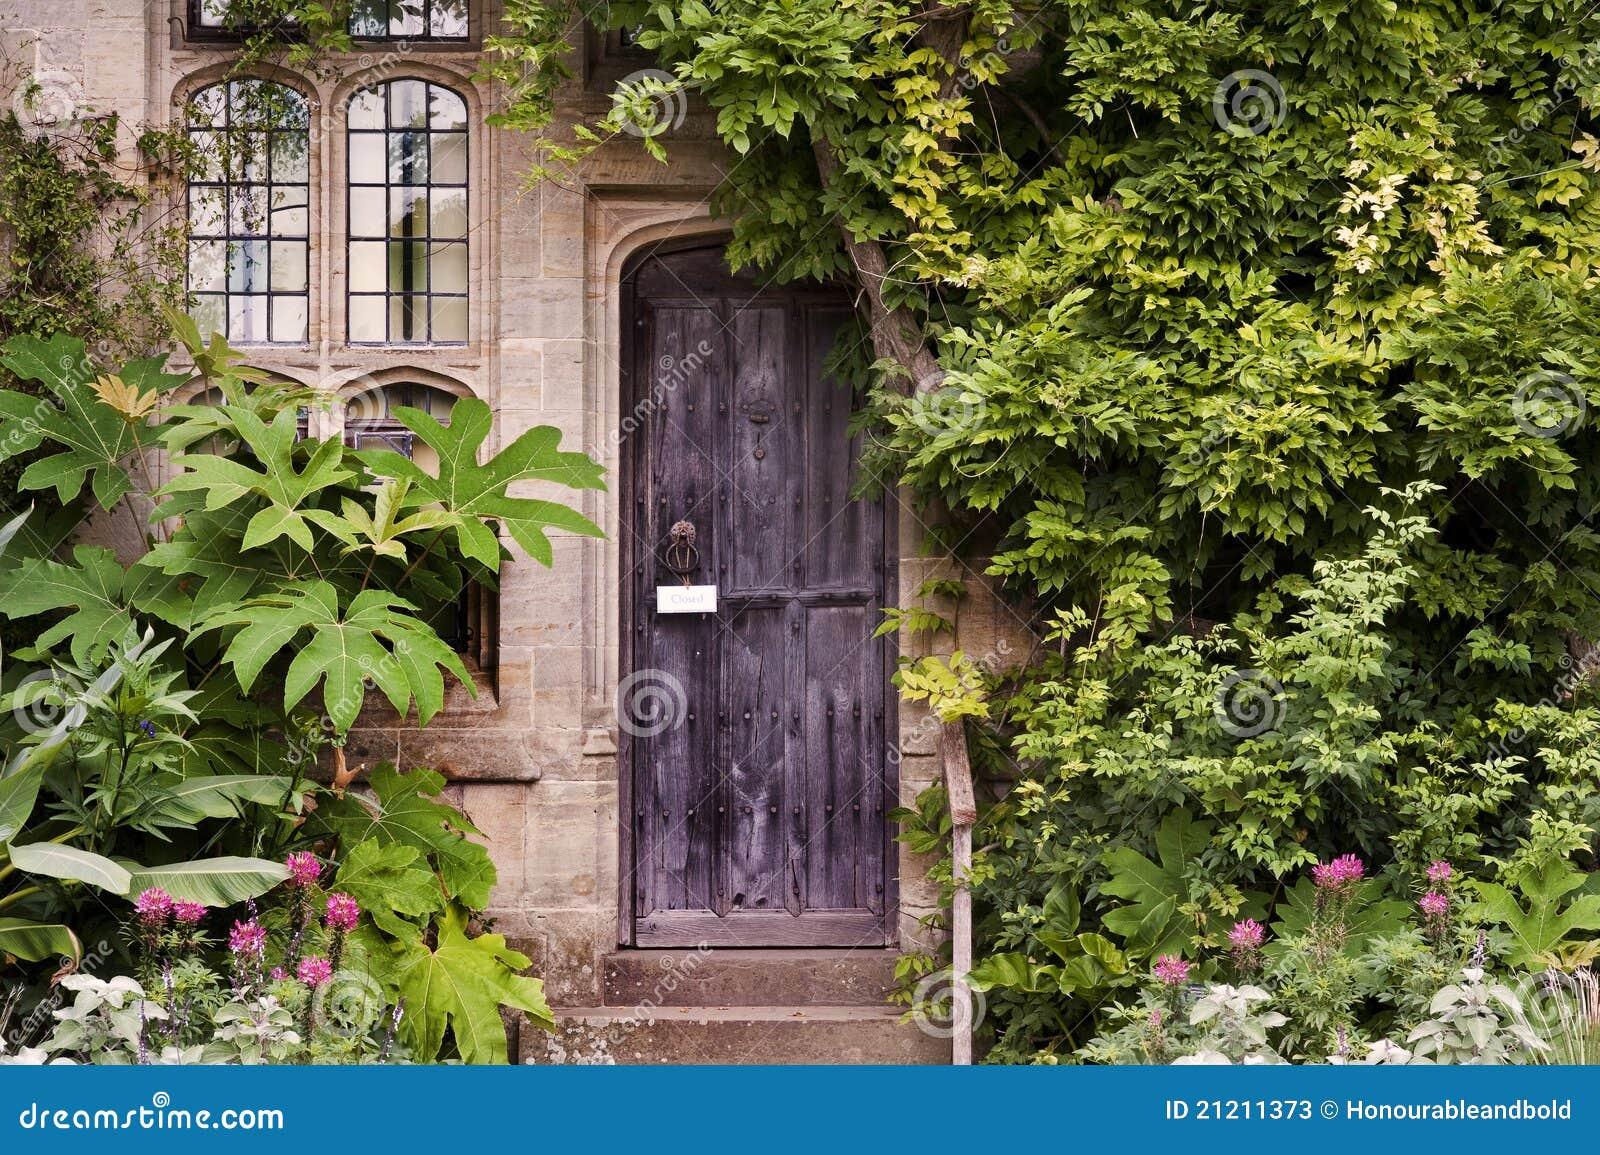 Wooden front door of old stone brick house stock photos for Door of stone